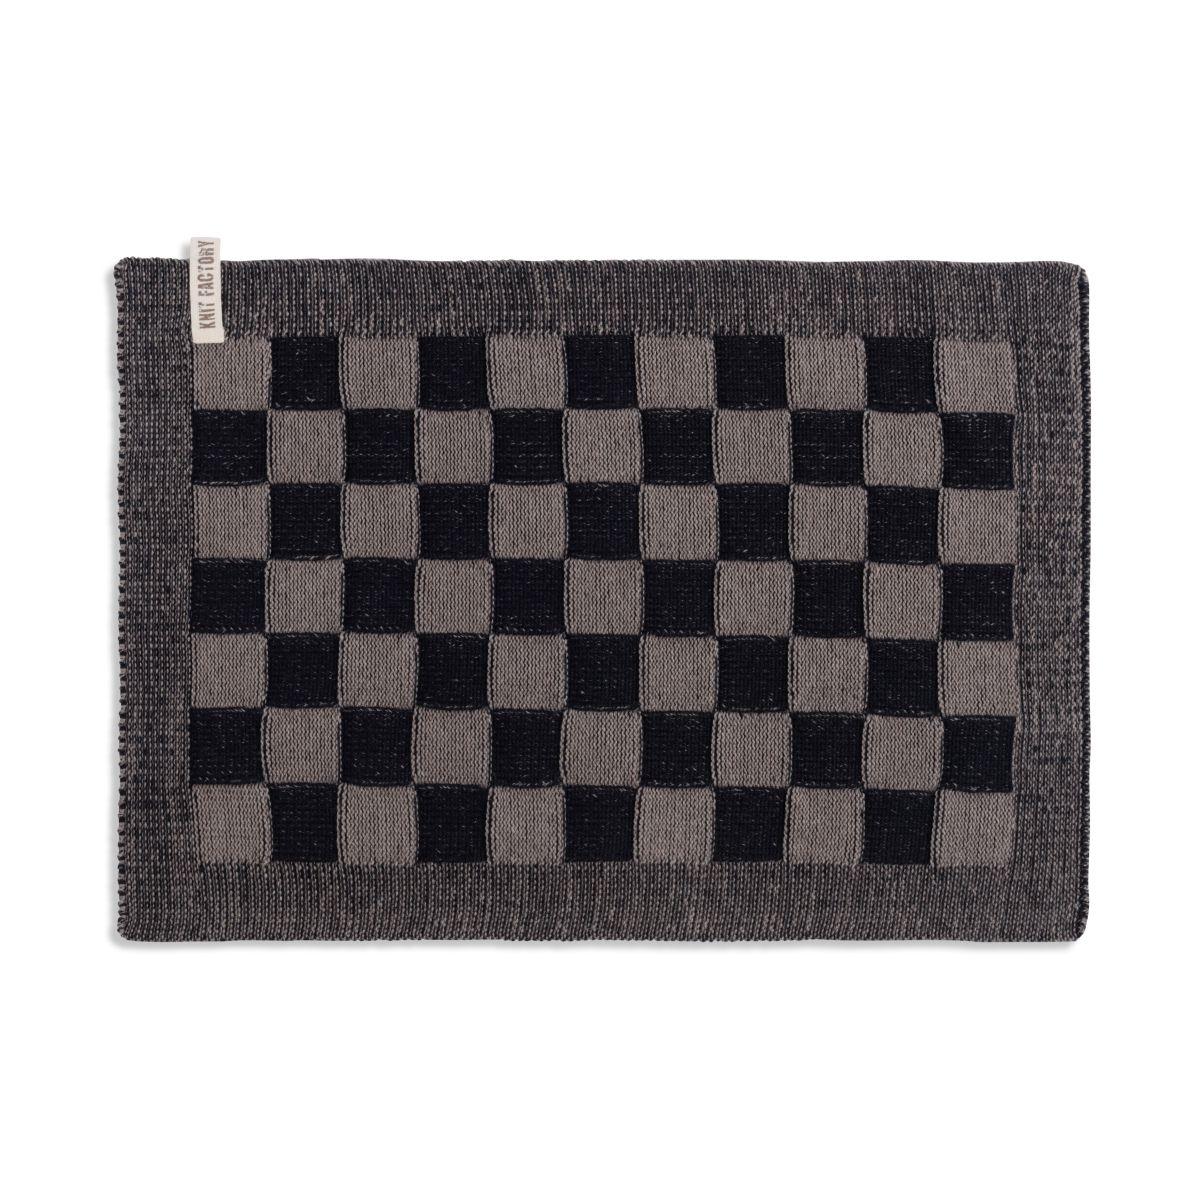 knit factory 2010239 placemat grote blok 2 kleuren zwart taupe